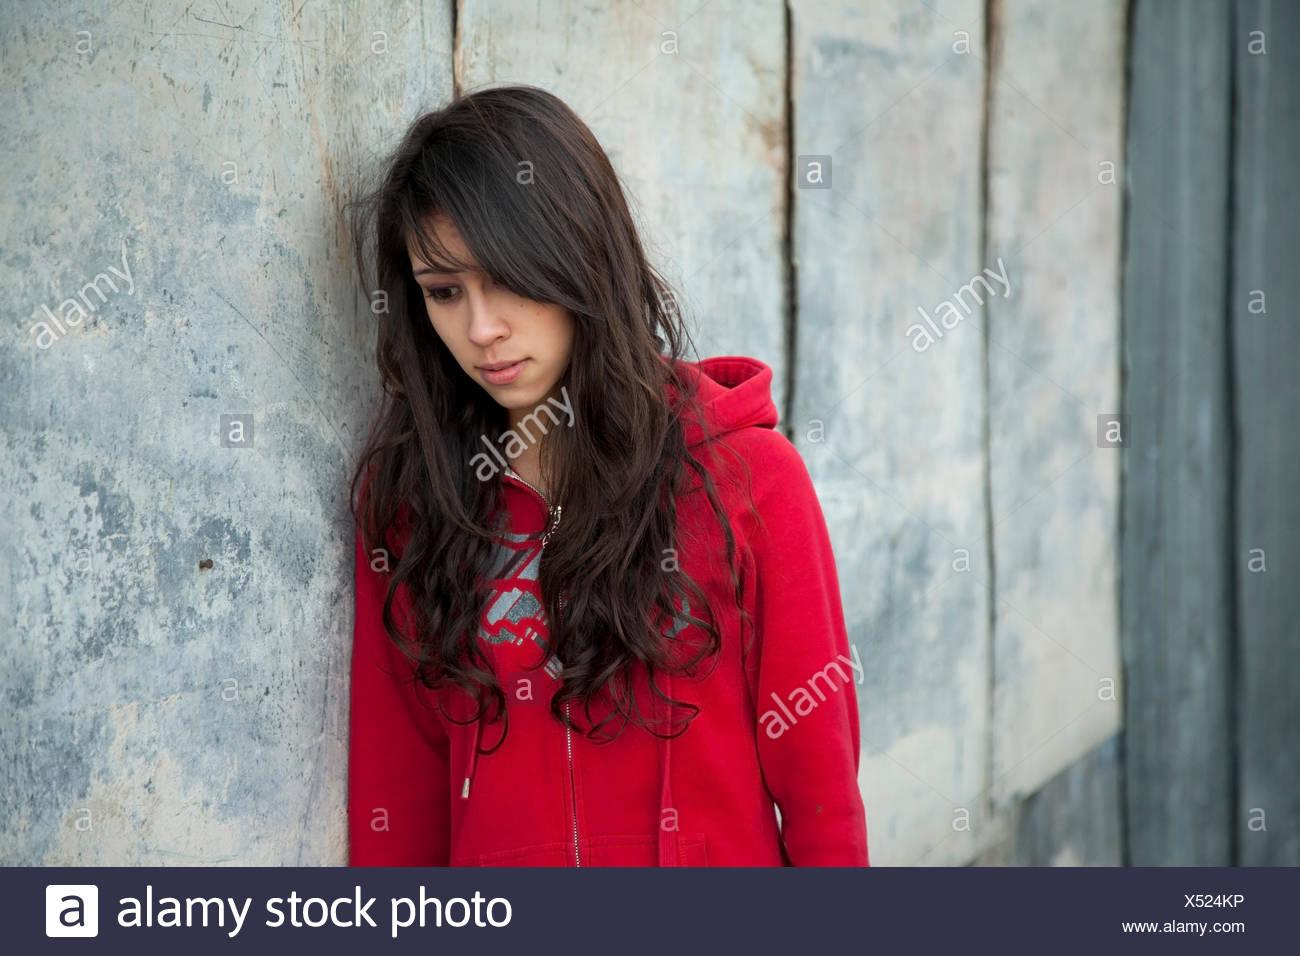 sad depression alone - Stock Image